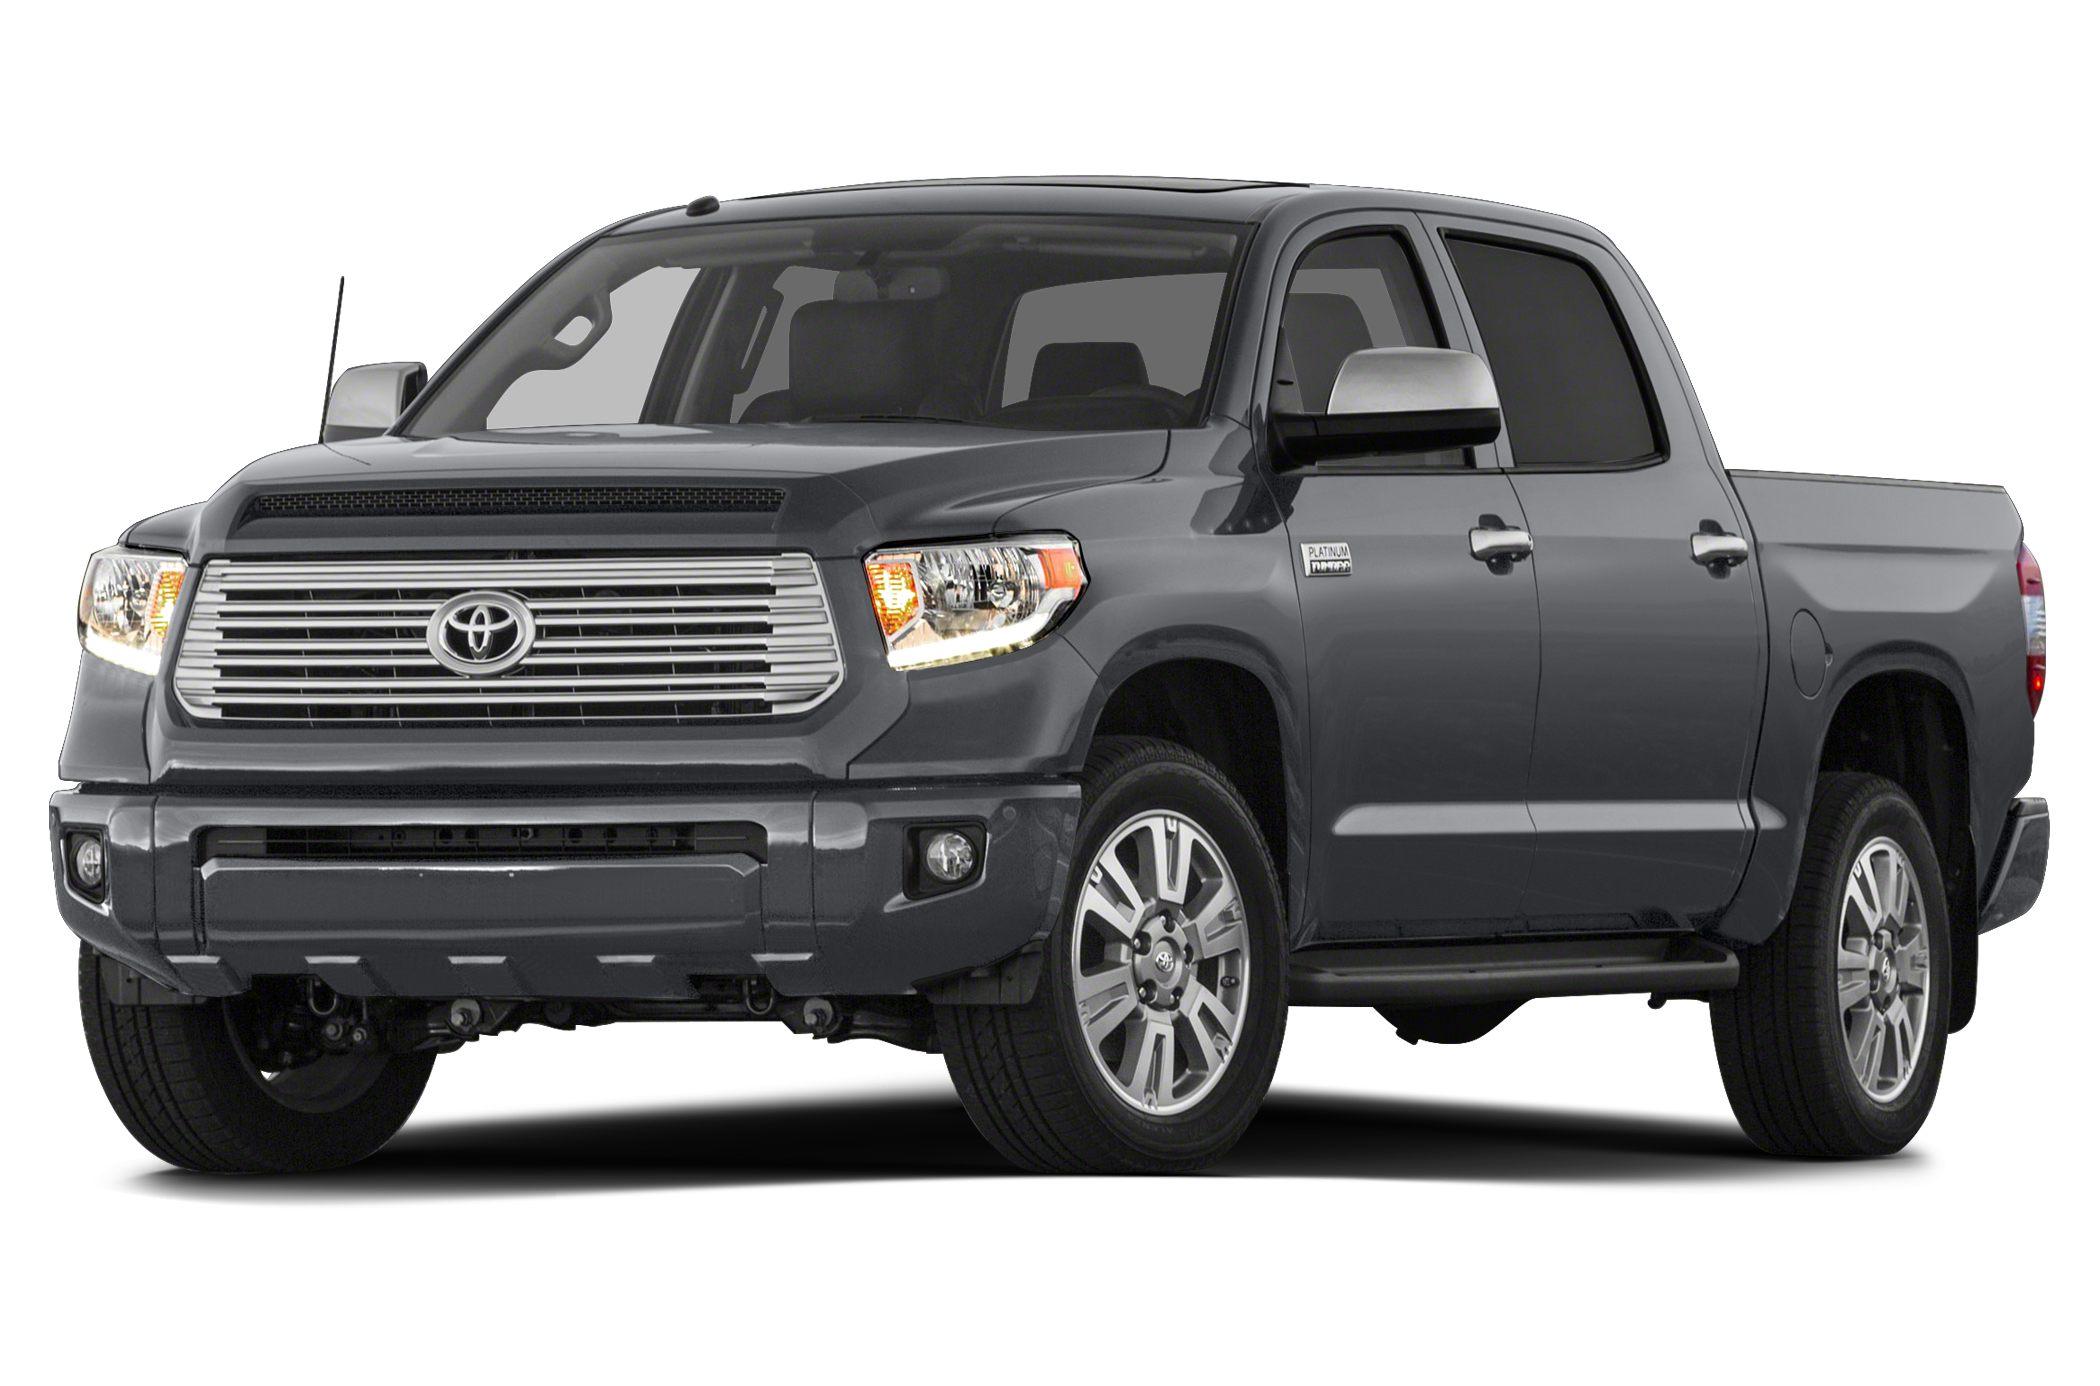 Toyota Isis 2016 In Pakistan Cactotc